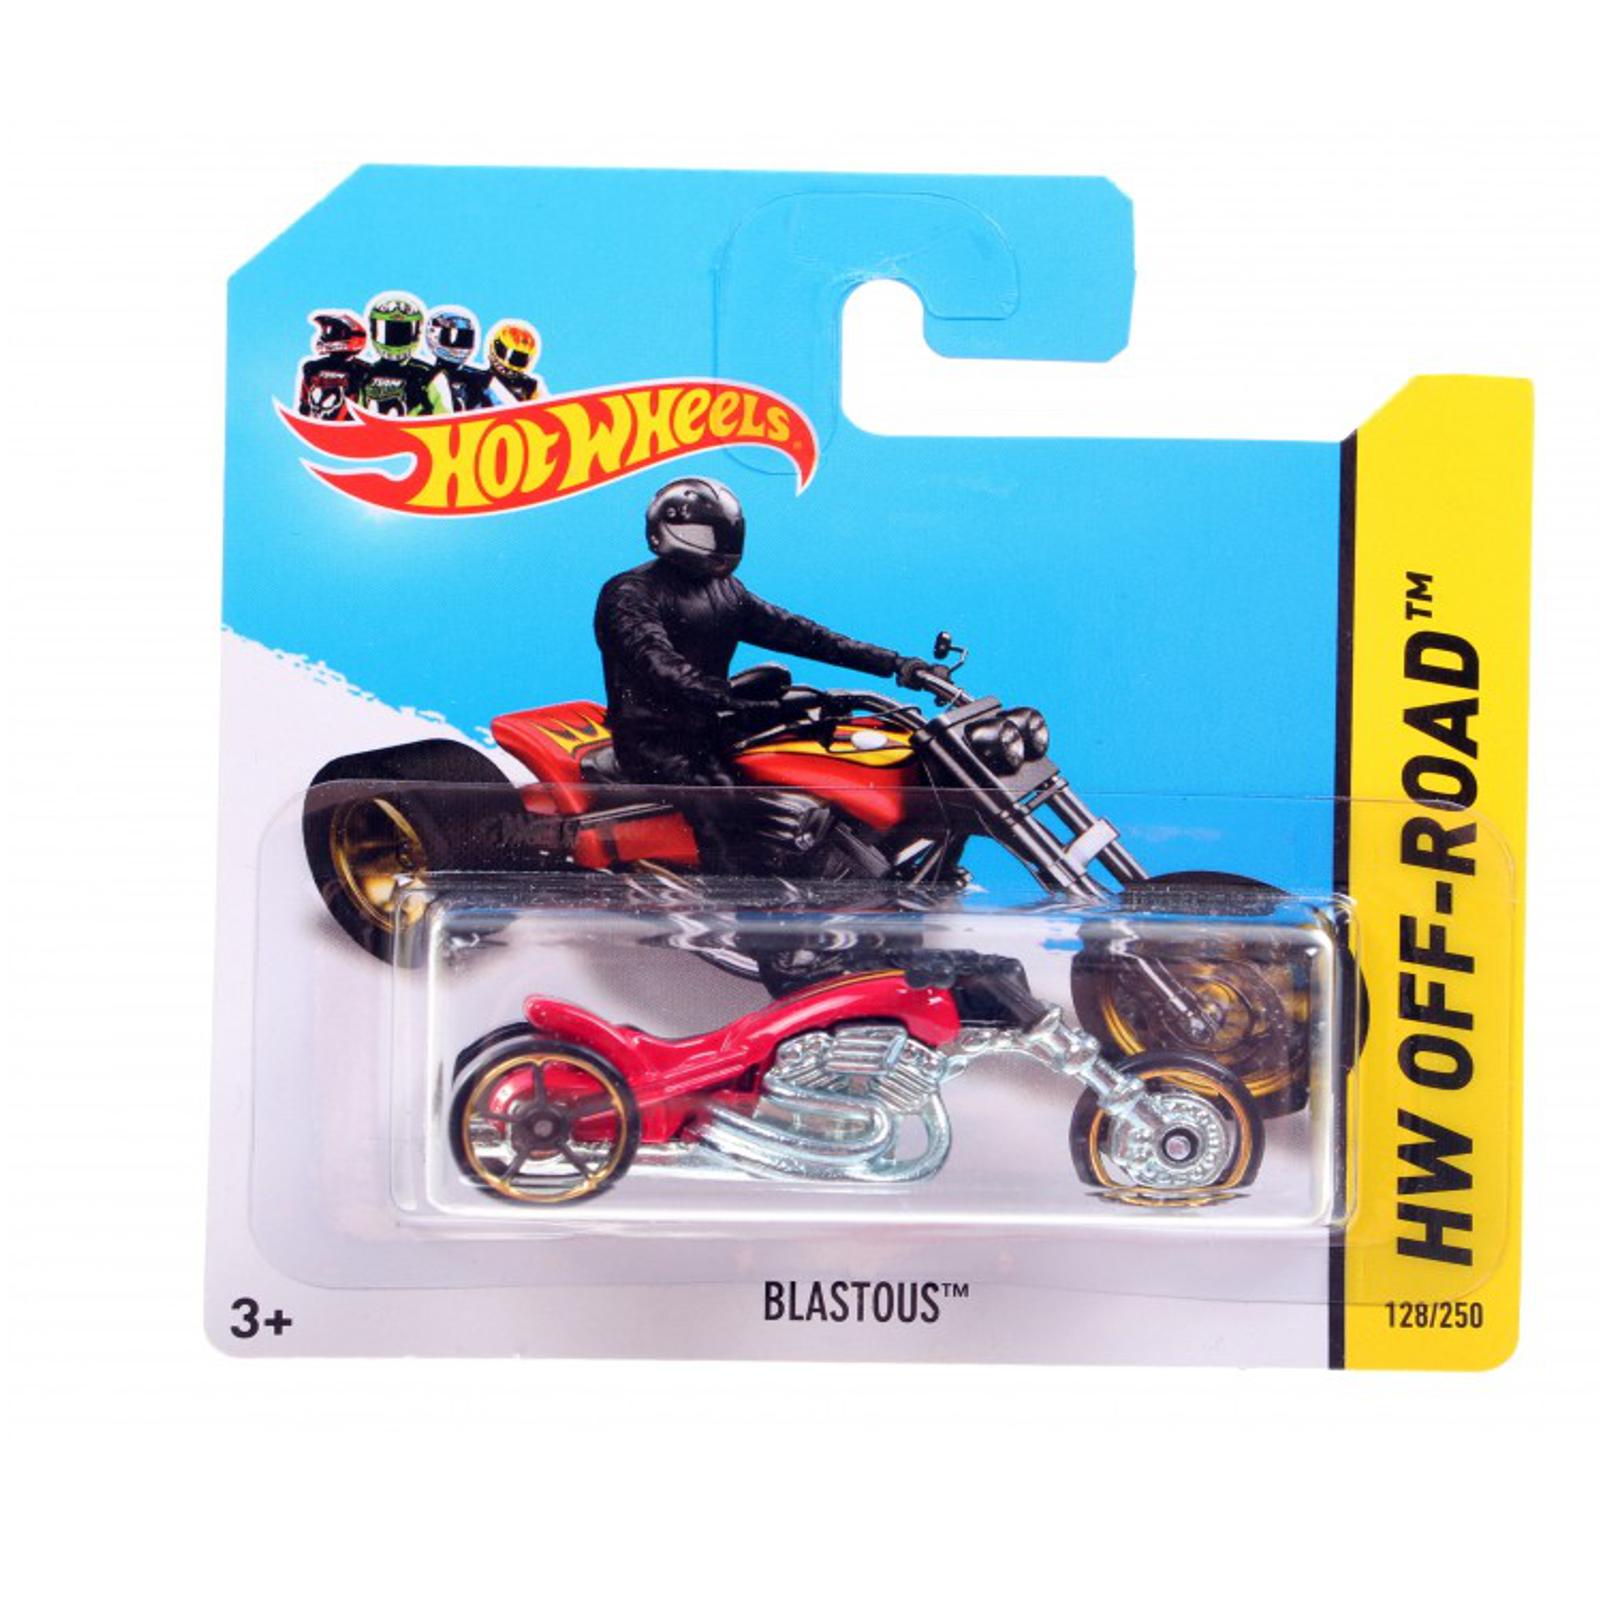 ����������� Hot Wheels ��� ������ Blastous